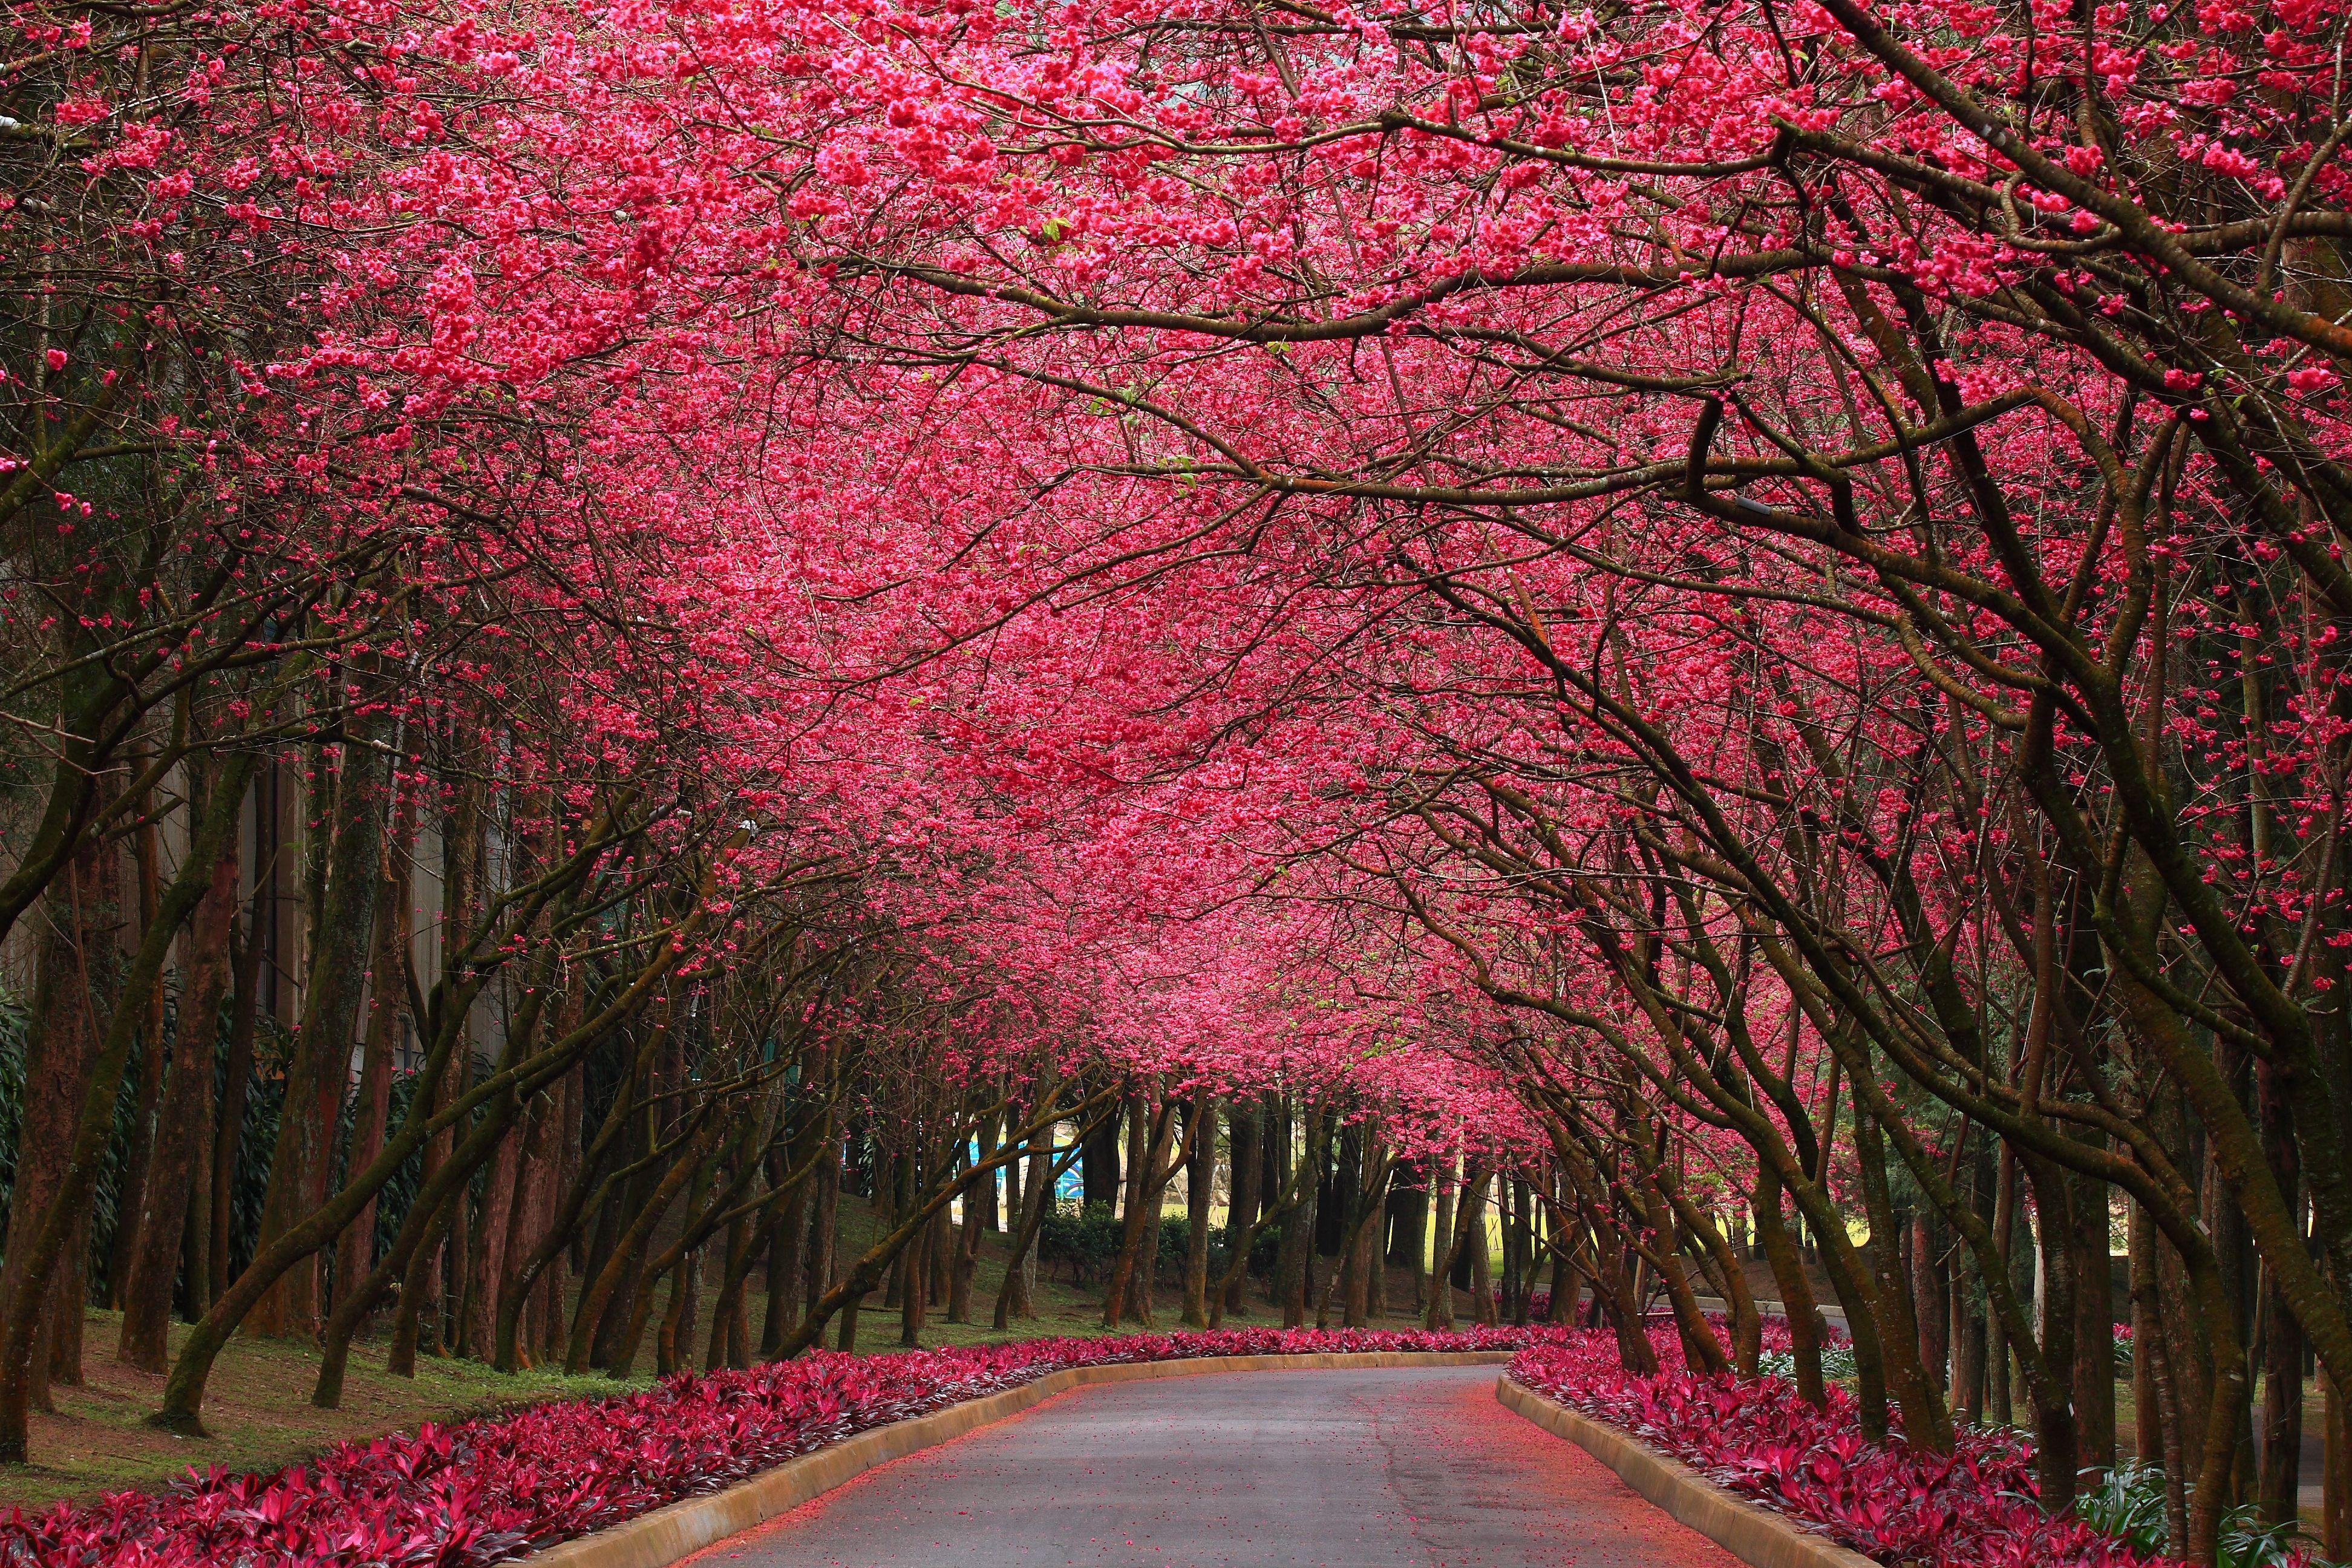 Early spring pink flowering trees wallpaper pink flowering trees early spring pink flowering trees wallpaper pink flowering trees categories flowers downloads 15282 mightylinksfo Gallery